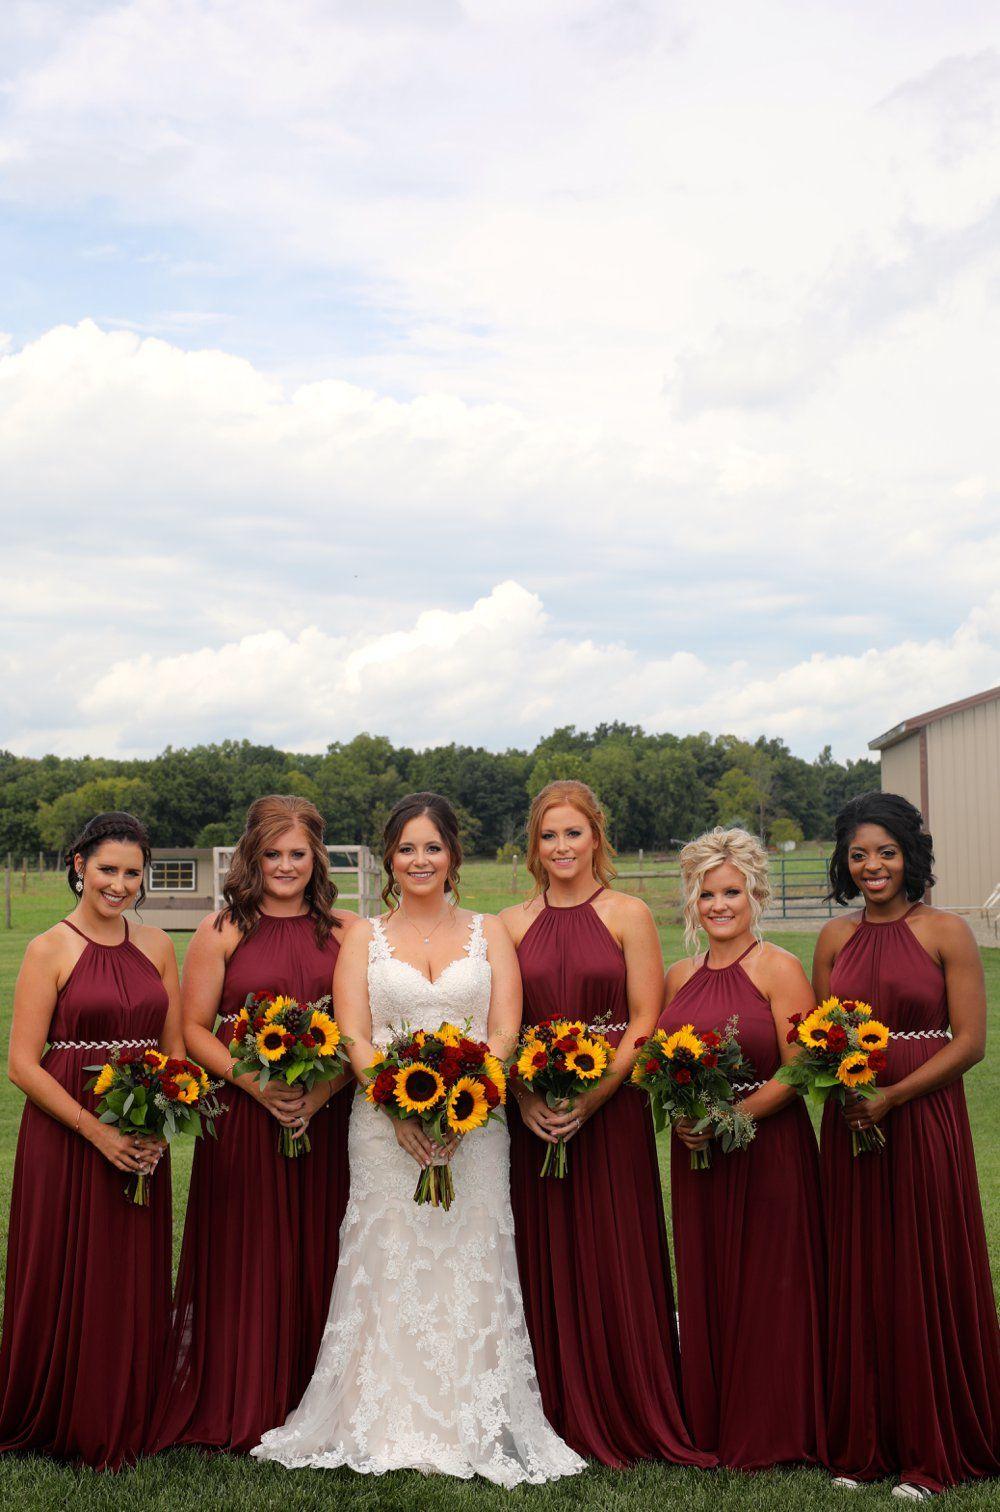 Rustic Glam Backyard Wedding On An 8k Budget Wine Bridesmaid Dresses Maroon Bridesmaid Dresses Maroon Bridesmaid,Wedding Dress Sample Sale Online Uk